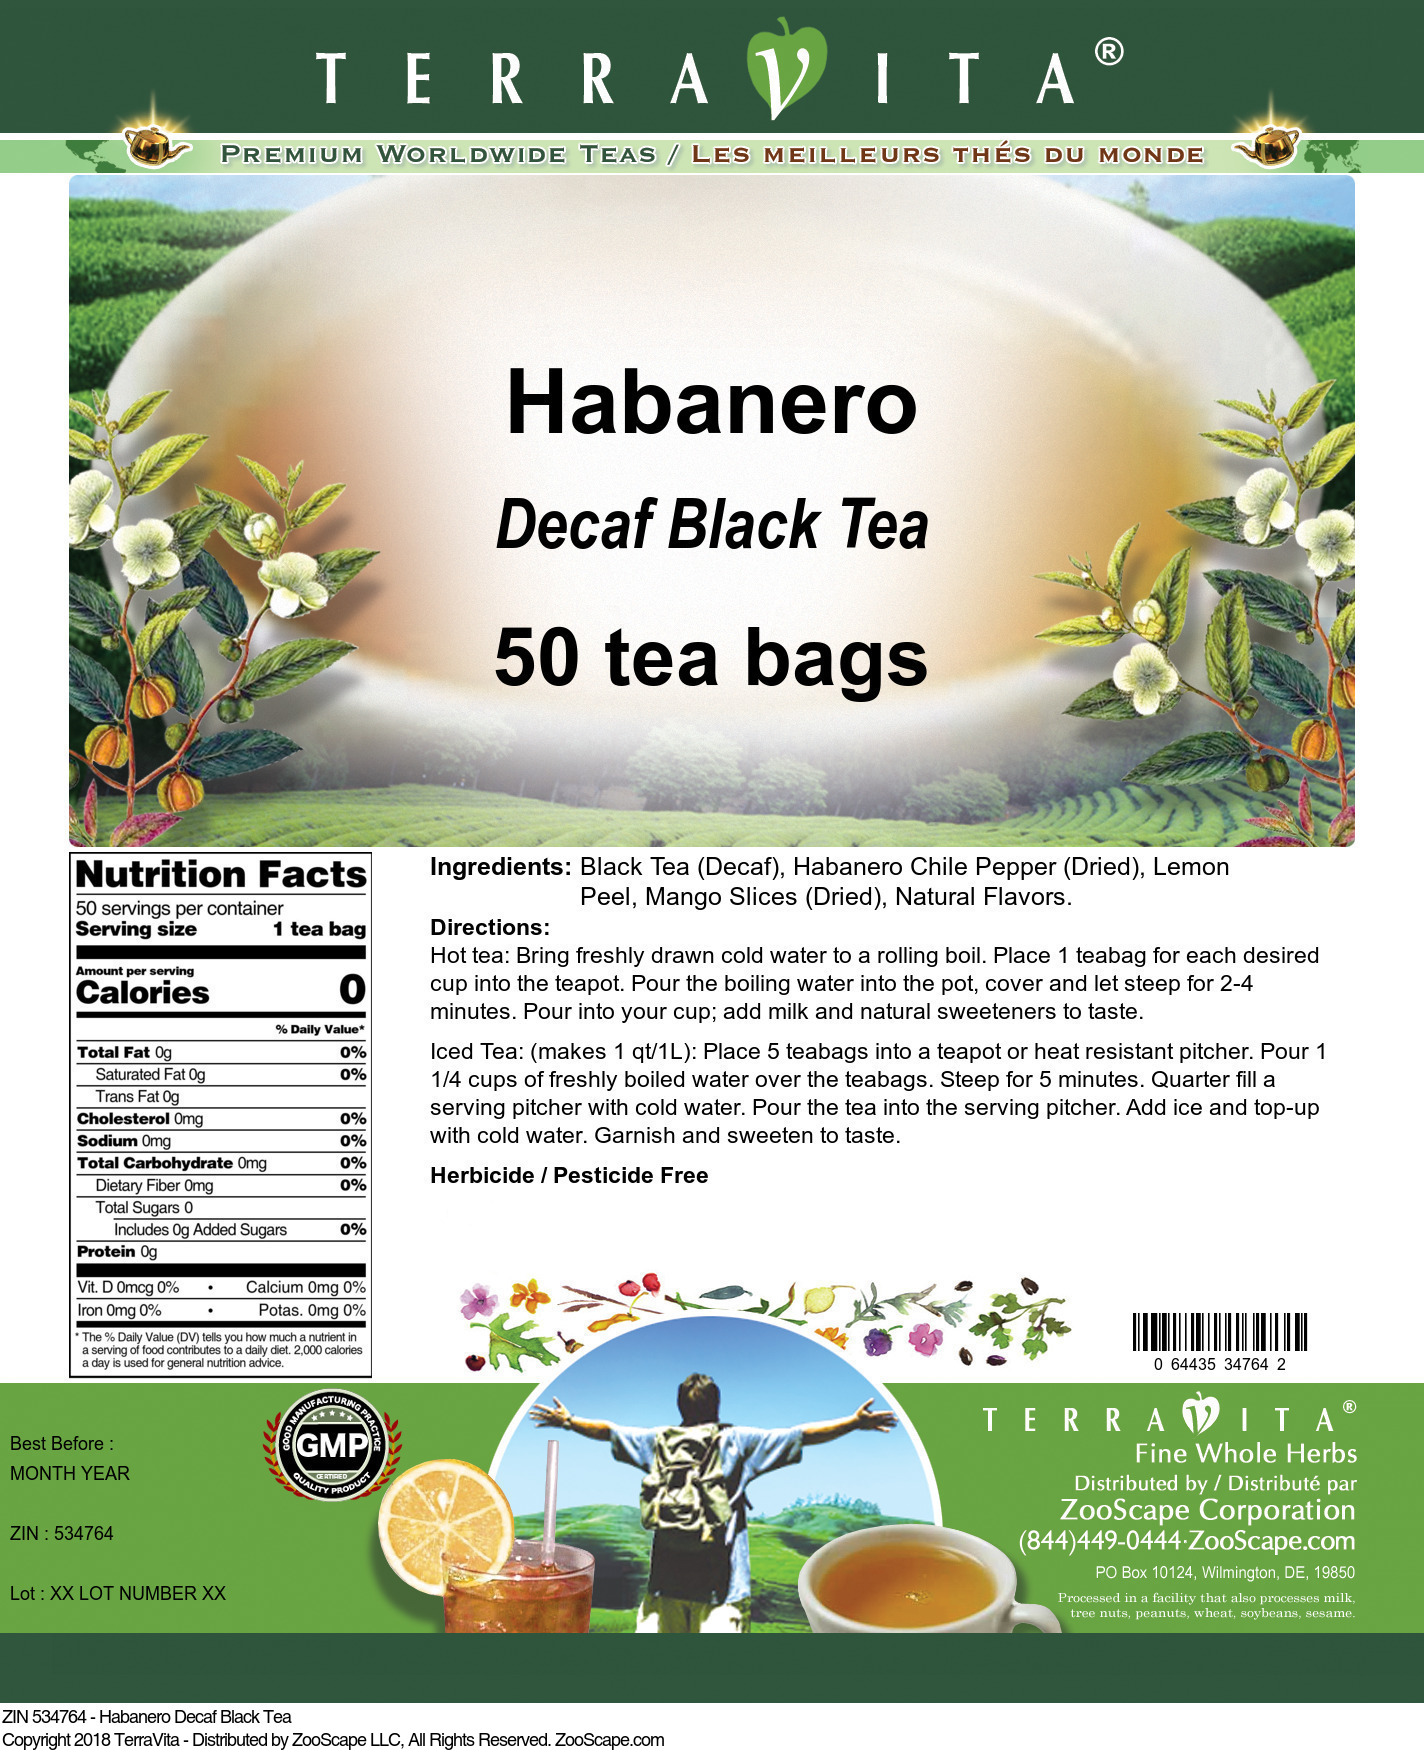 Habanero Decaf Black Tea